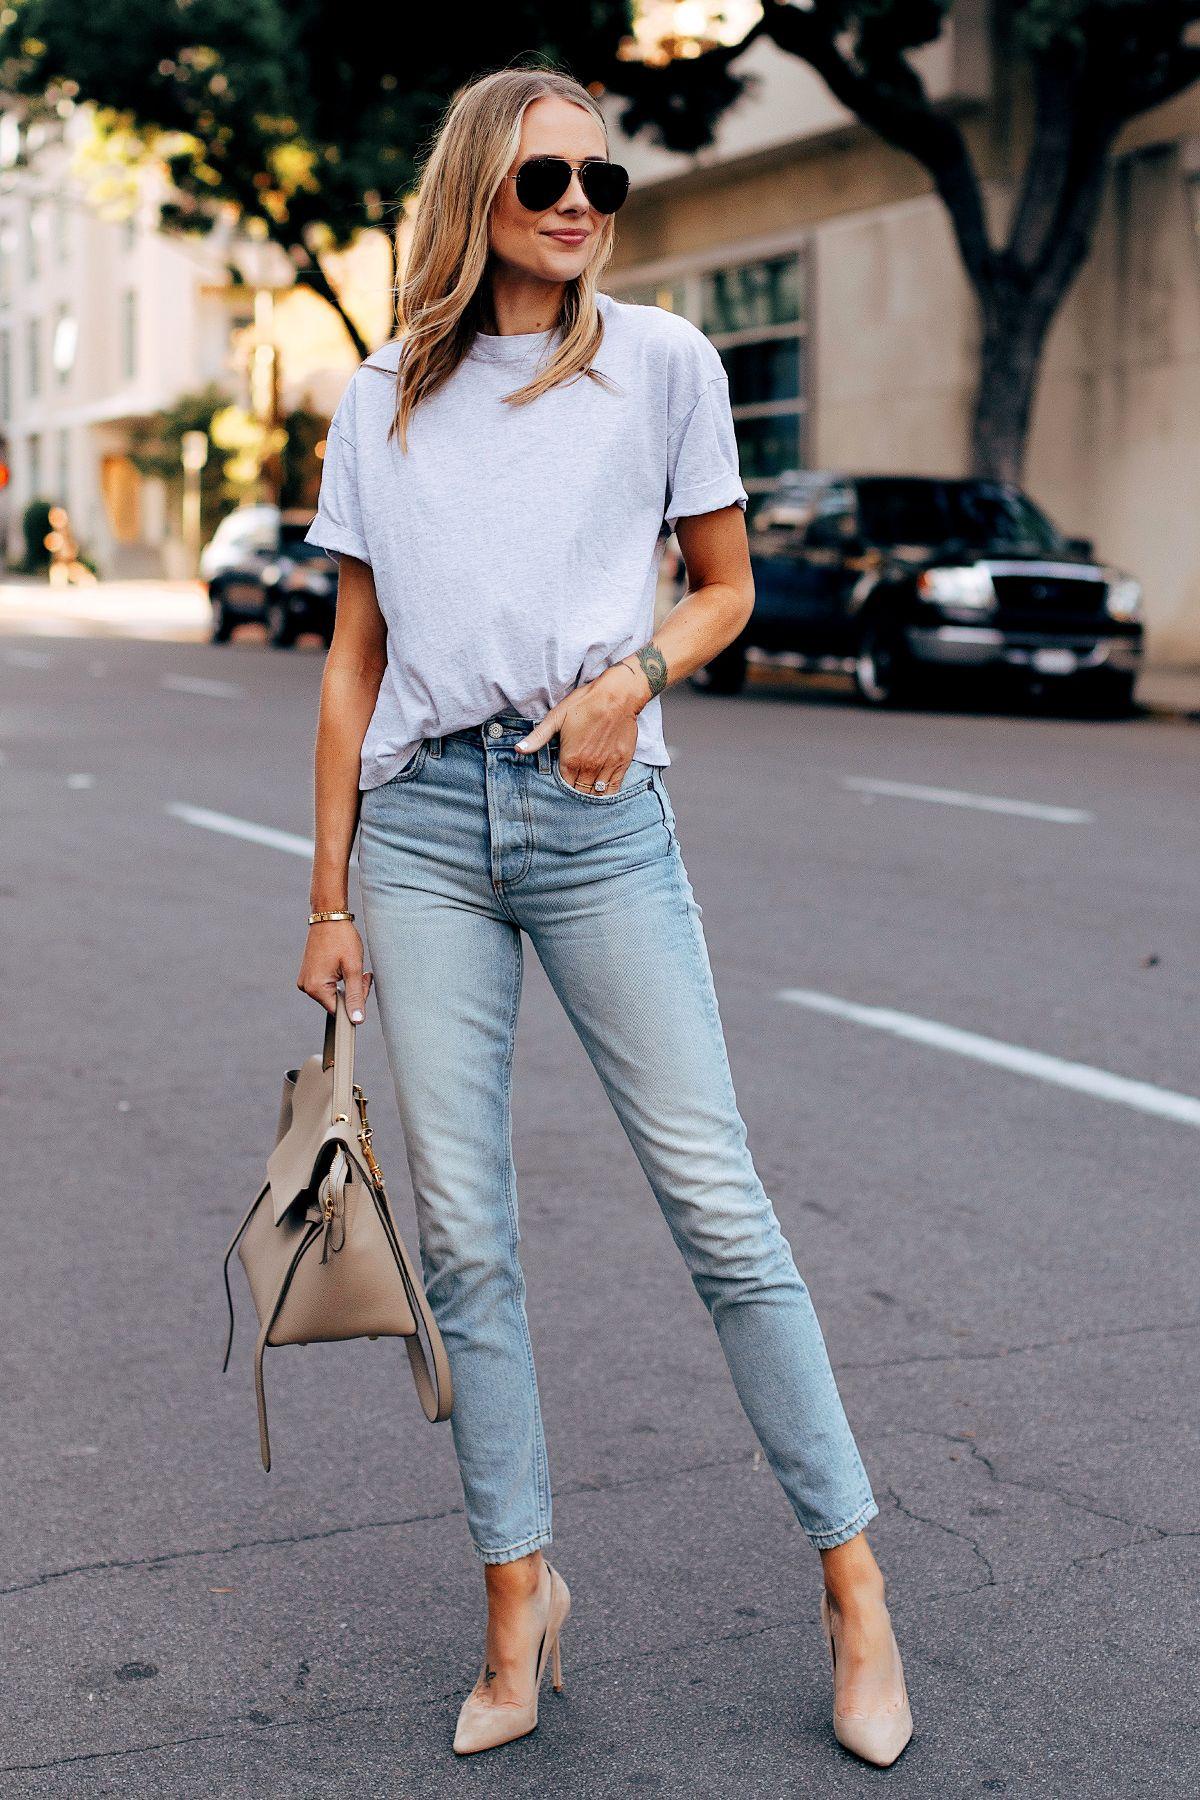 b73b774469257 Fashion Jackson Wearing Topshop Grey Tshirt Boyish High Rise Skinny Jeans  Jimmy Choo Beige Romy Pumps